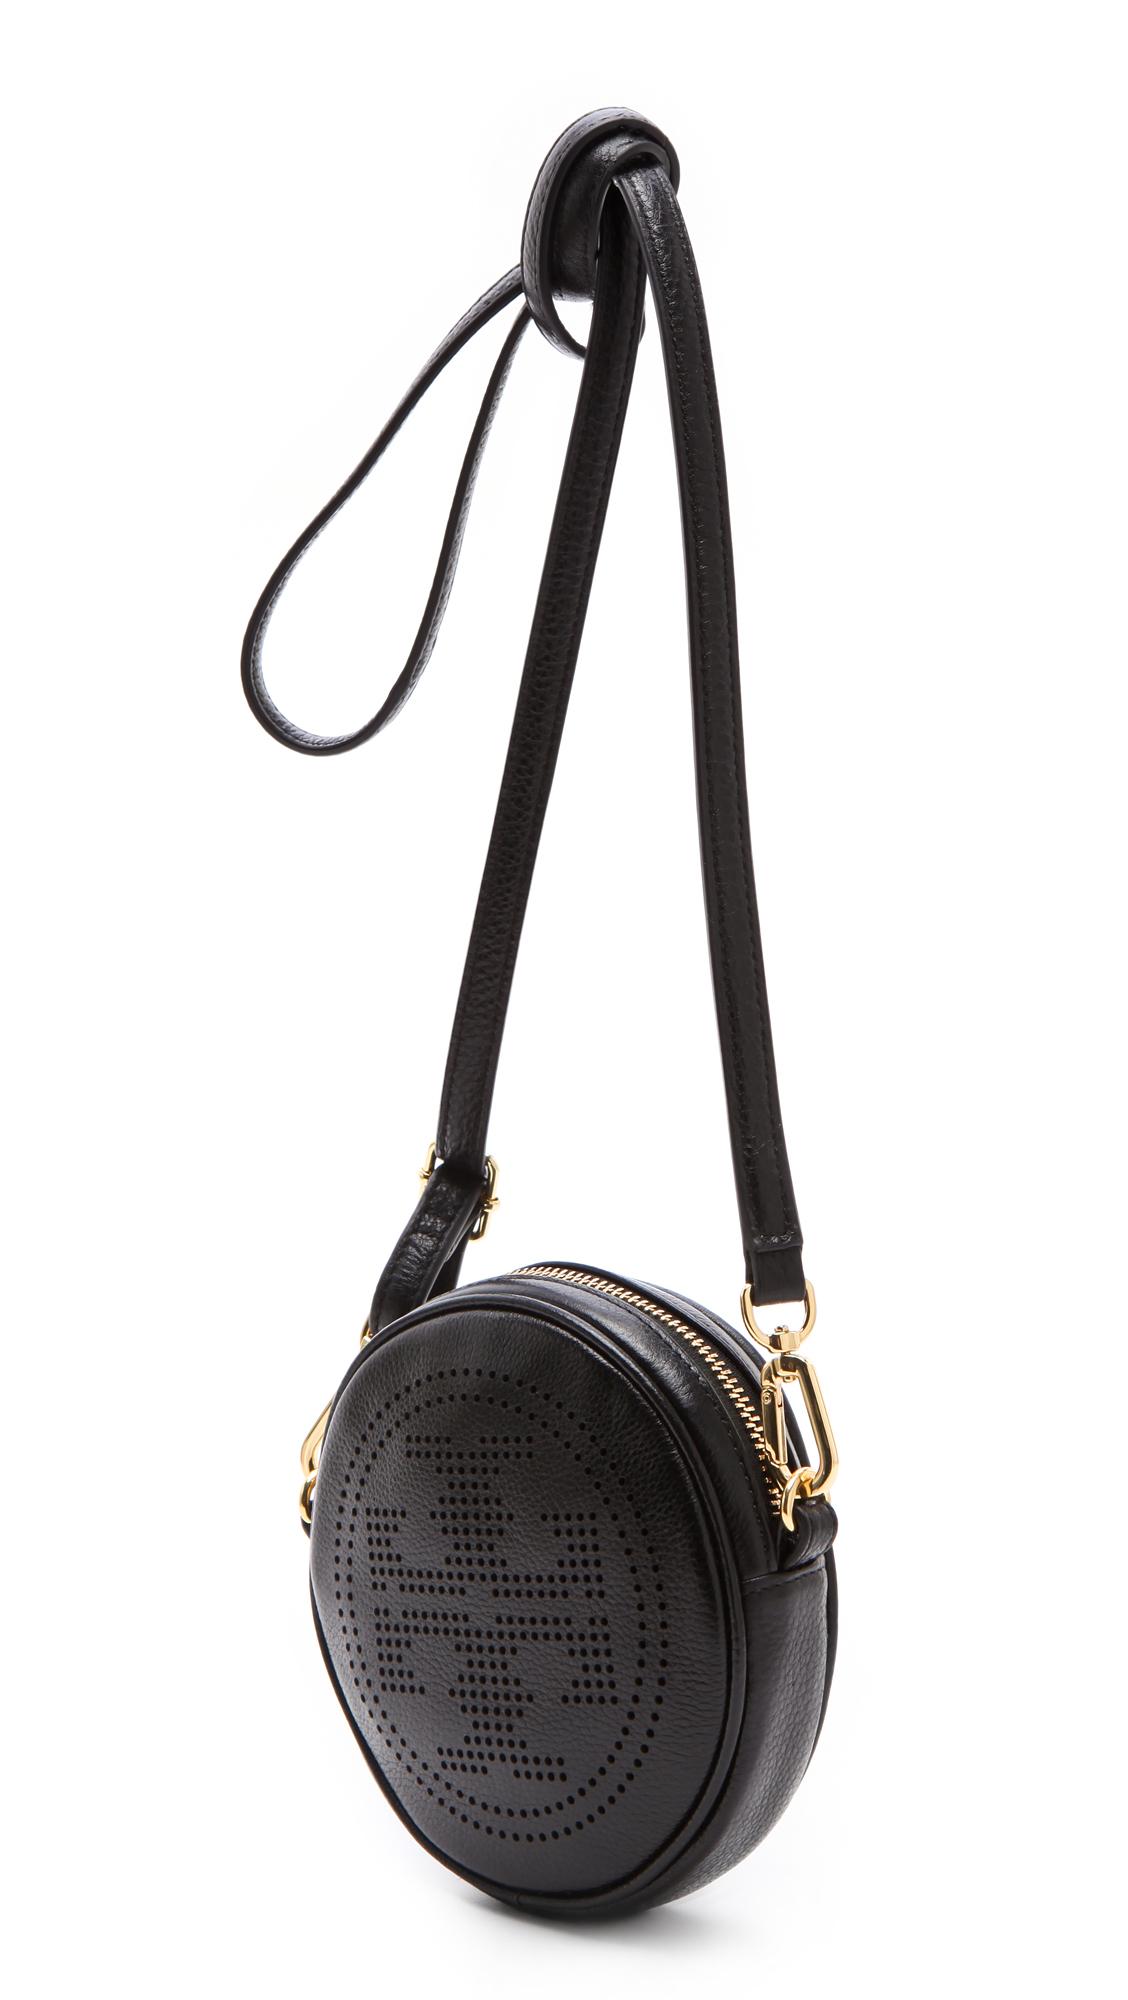 99a7cc5d0a75 Lyst - Tory Burch Perforated Logo Cross Body Bag in Black